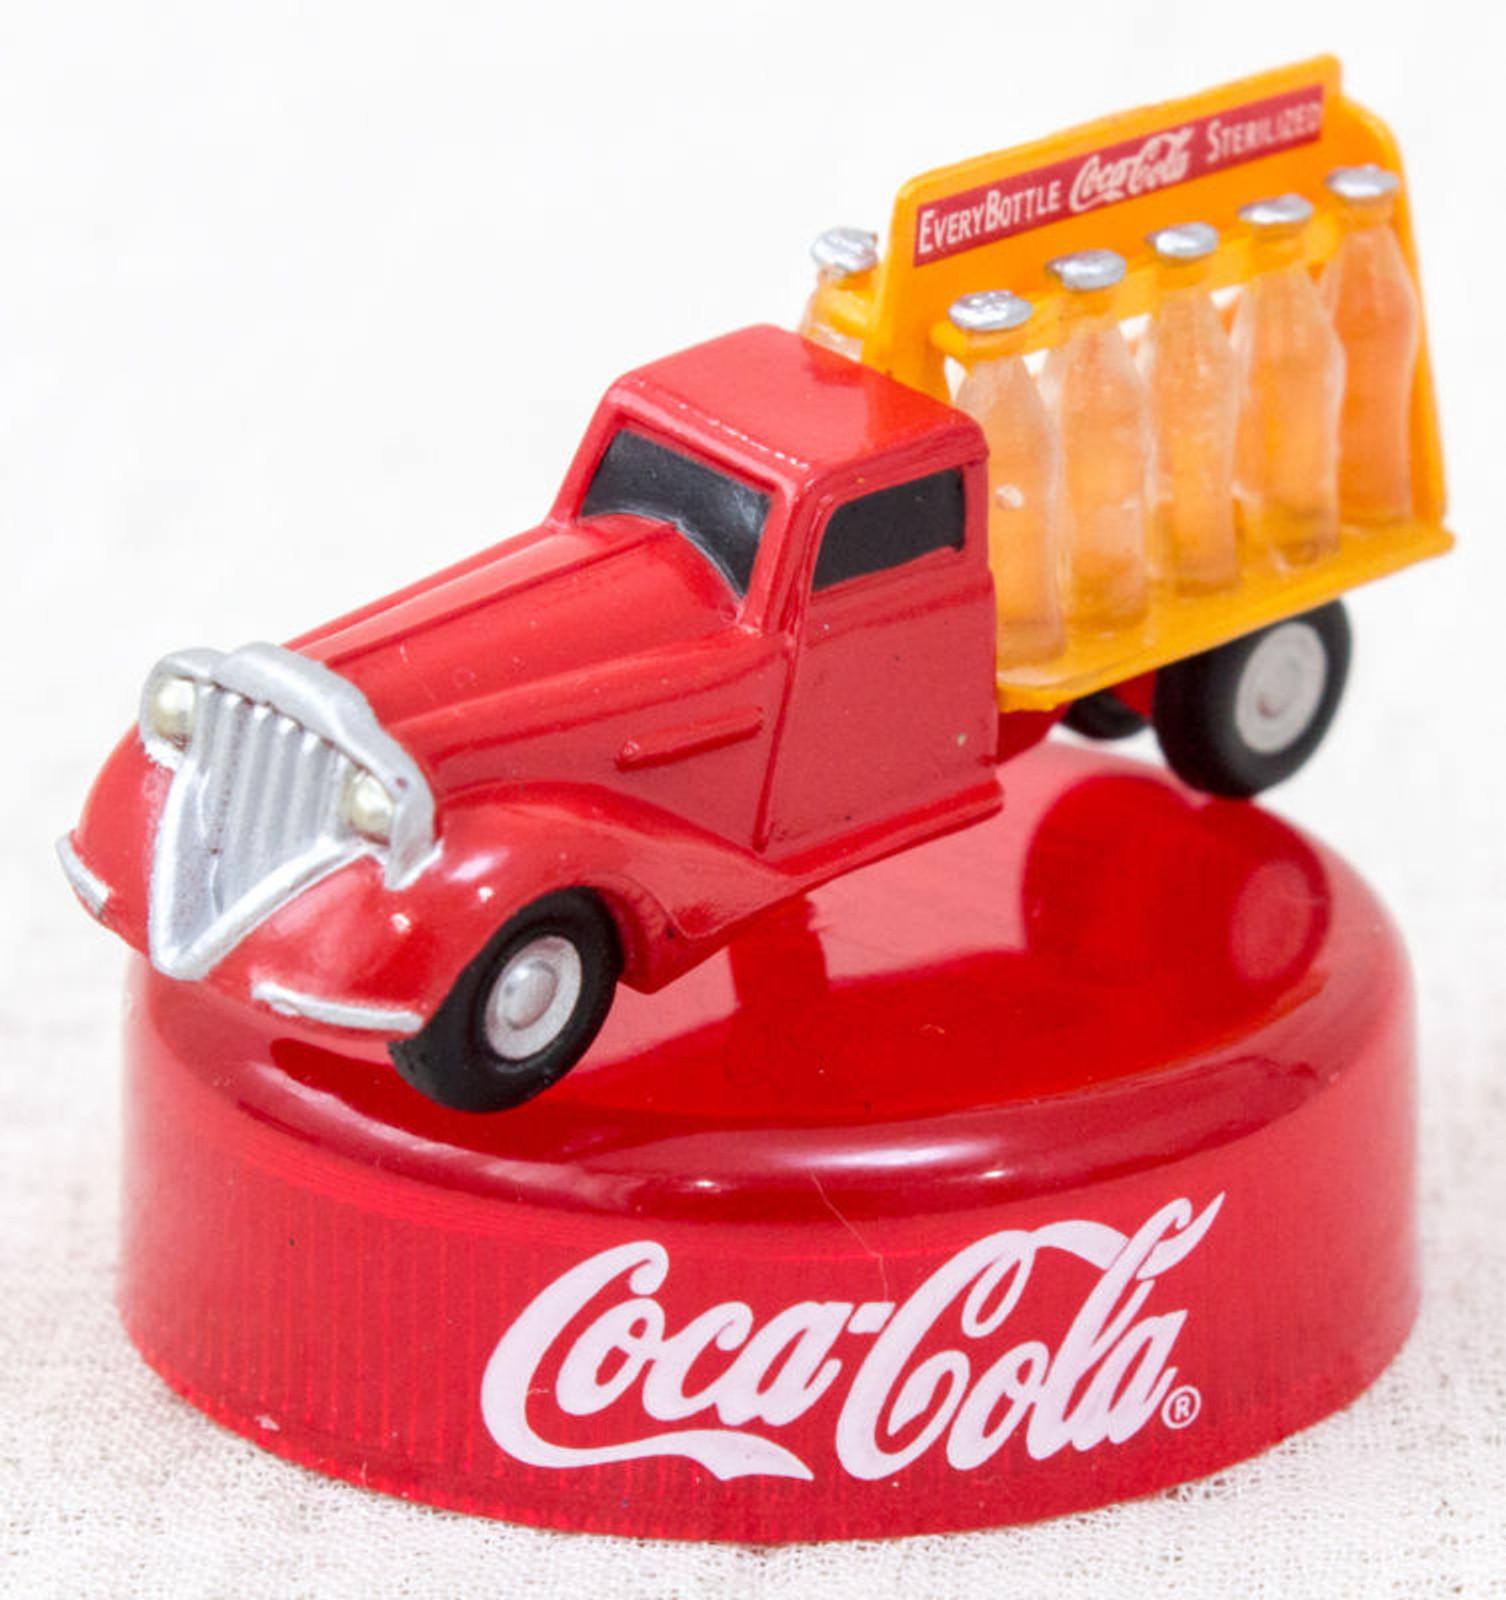 Coca-Cola Graffiti Delivery Truck Toy Miniature Figure Kaiyodo JAPAN